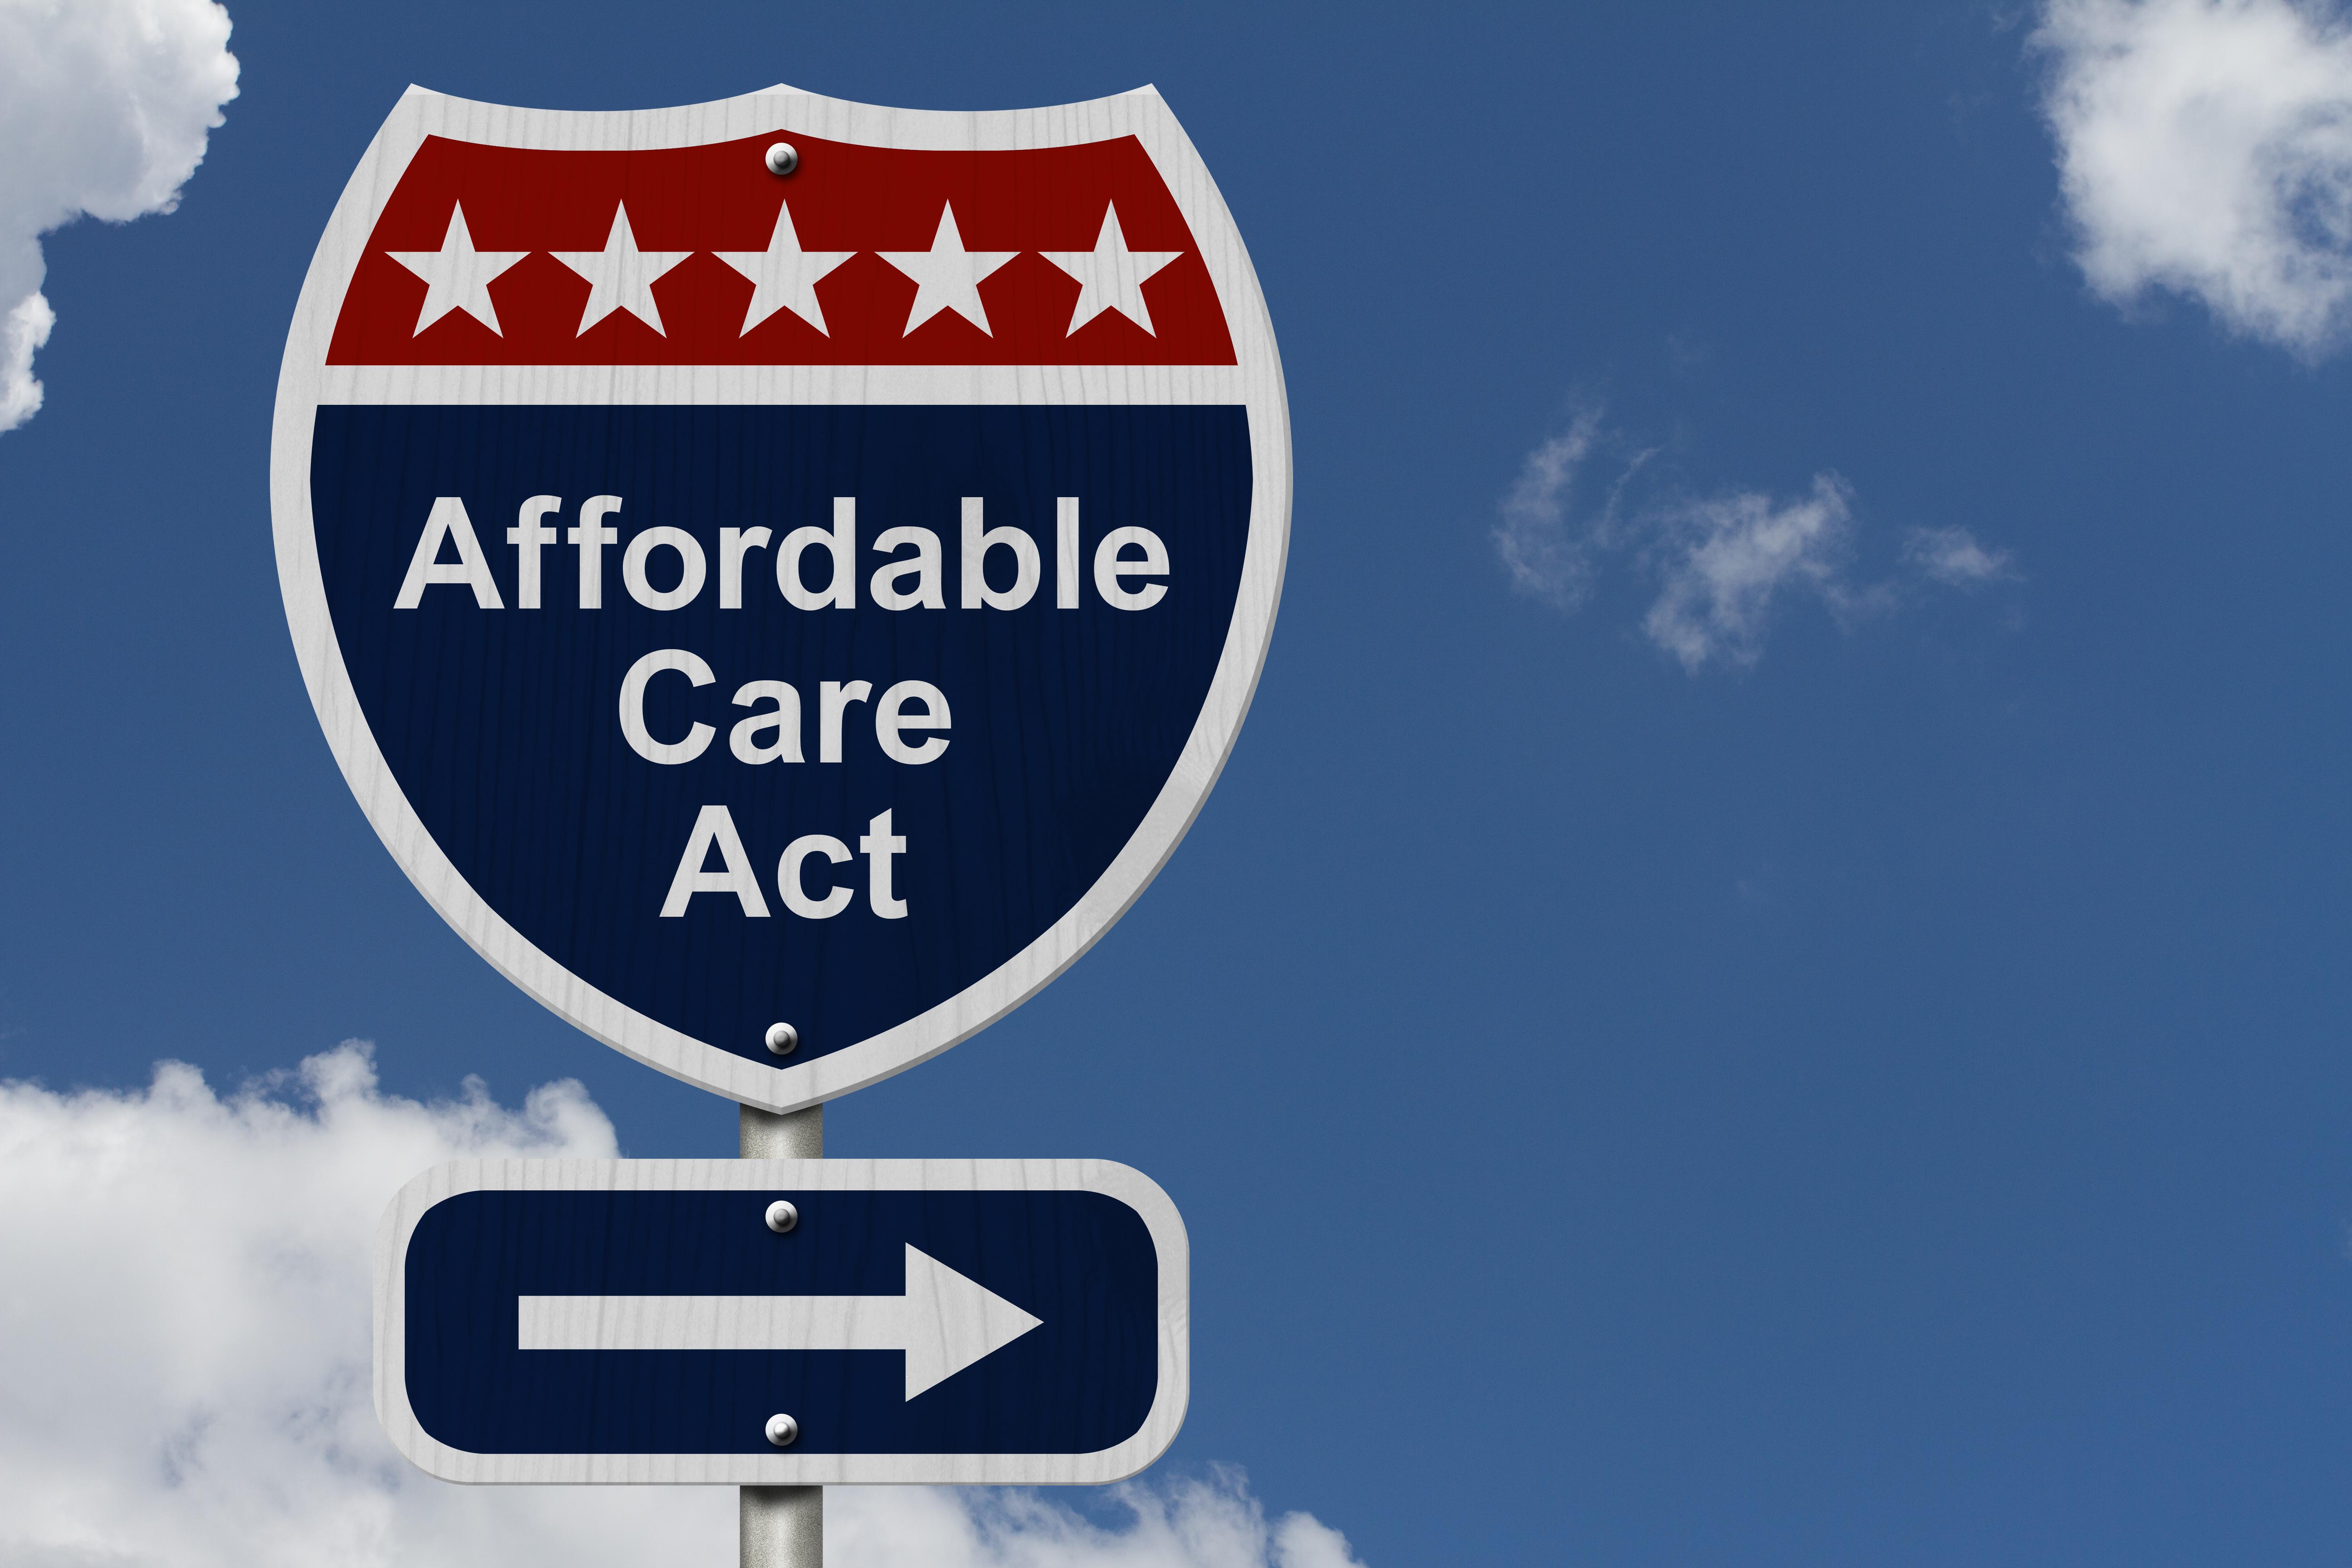 Democrats reintroduce legislation to create Medicaid-based public option